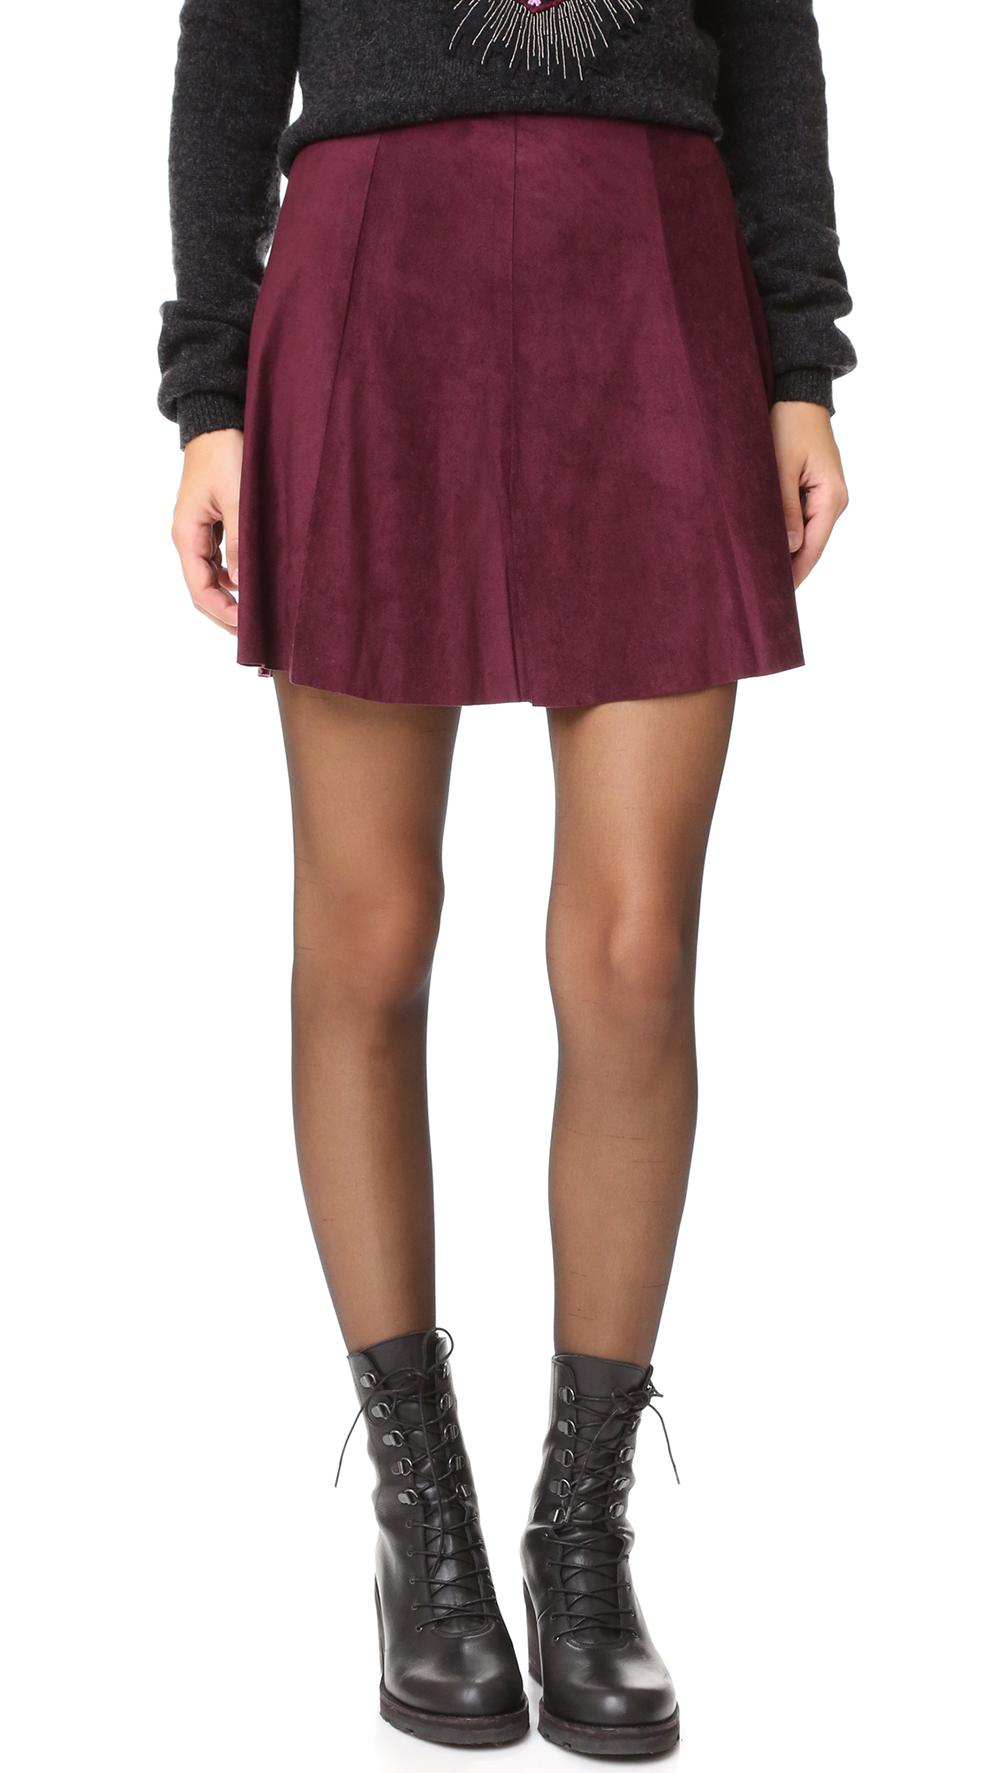 BB Dakota Kimber Faux Suede Skirt - The Perfect A-line Mini Skirt